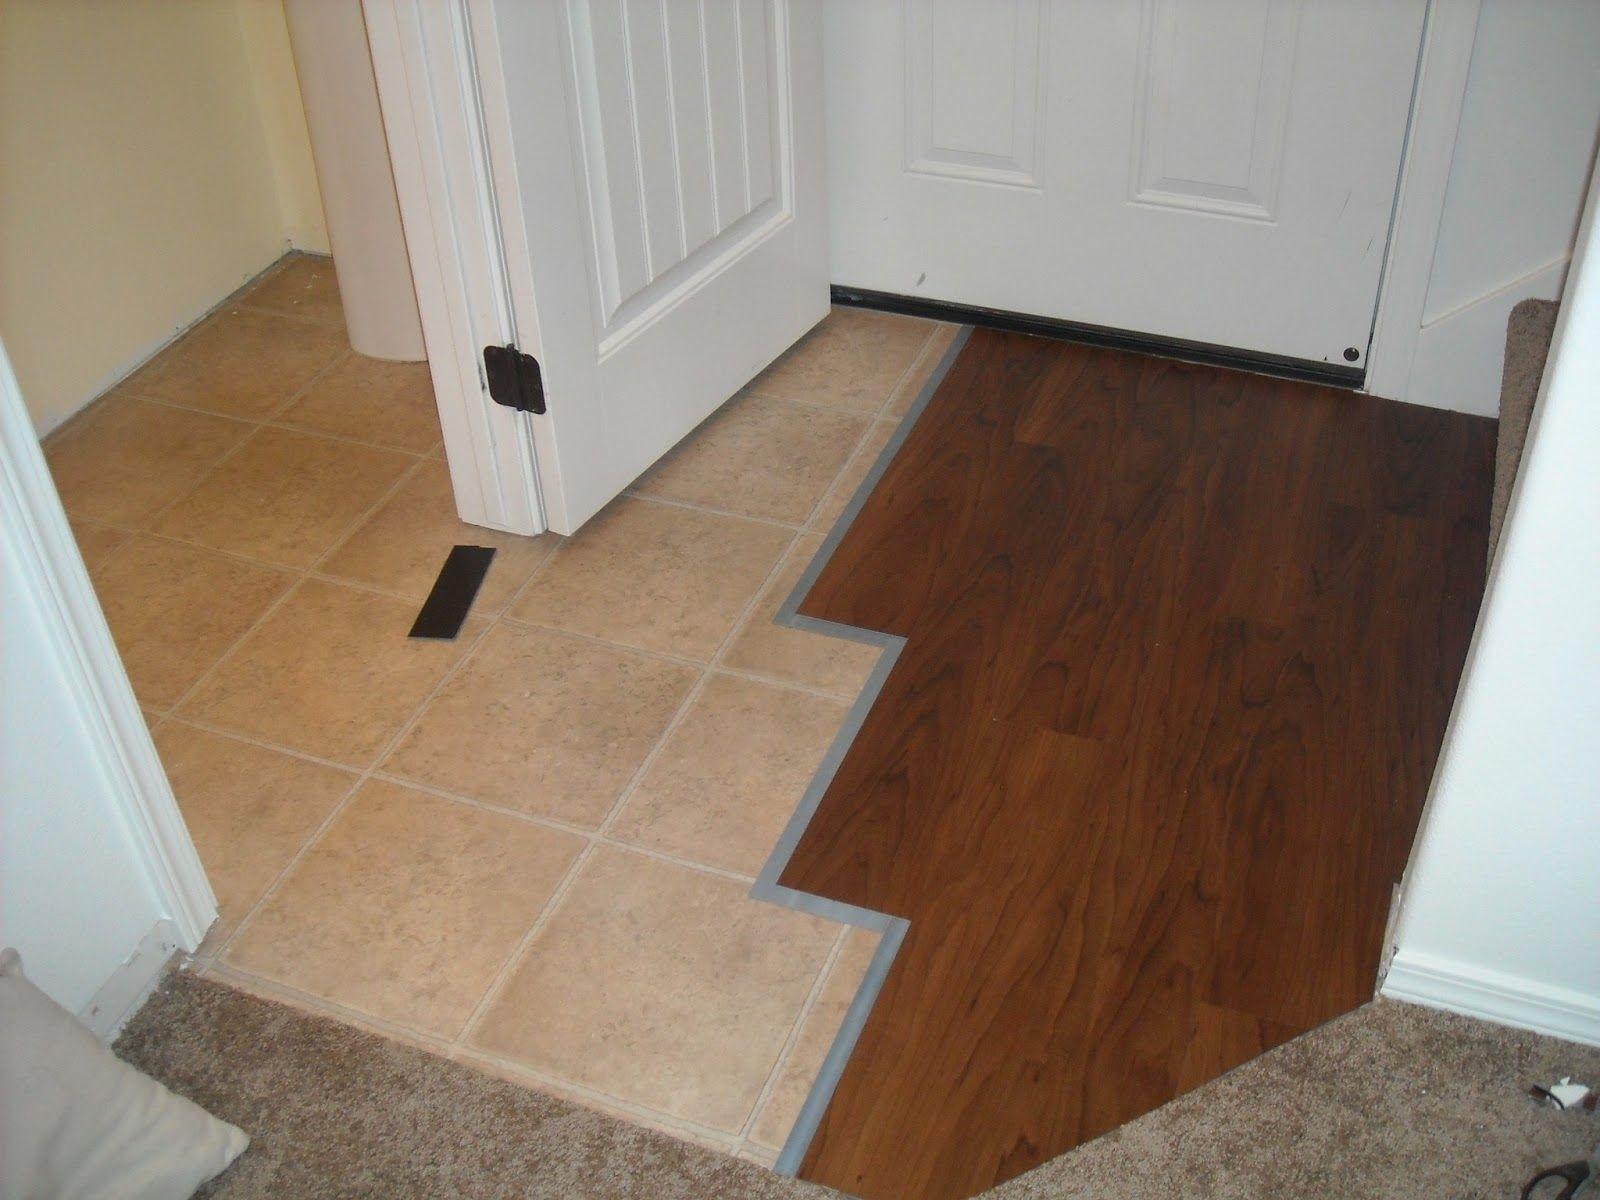 Floating Floor Over Vinyl Tile